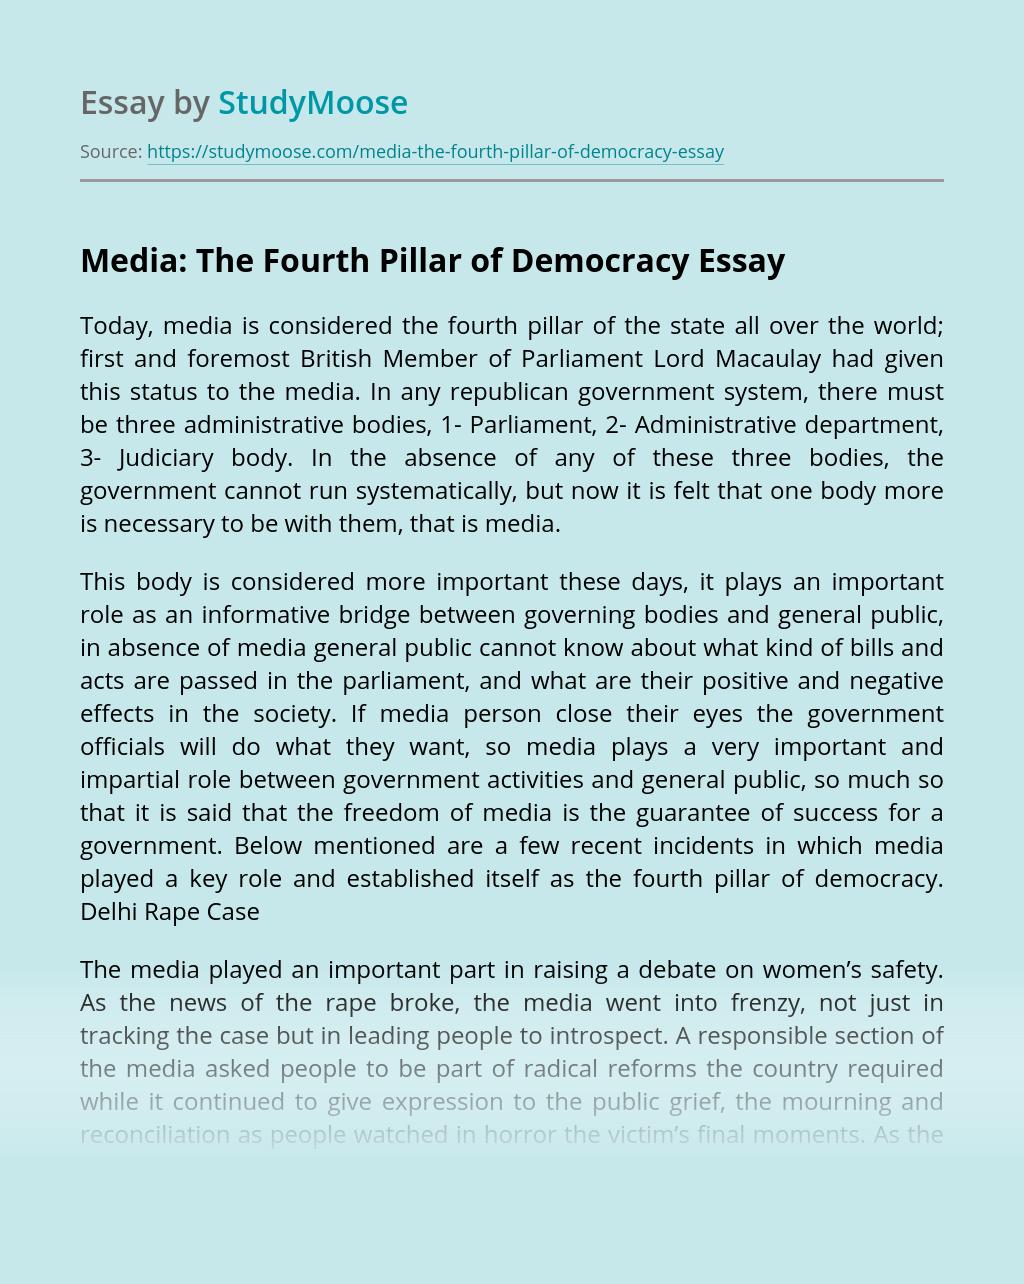 Media: The Fourth Pillar of Democracy